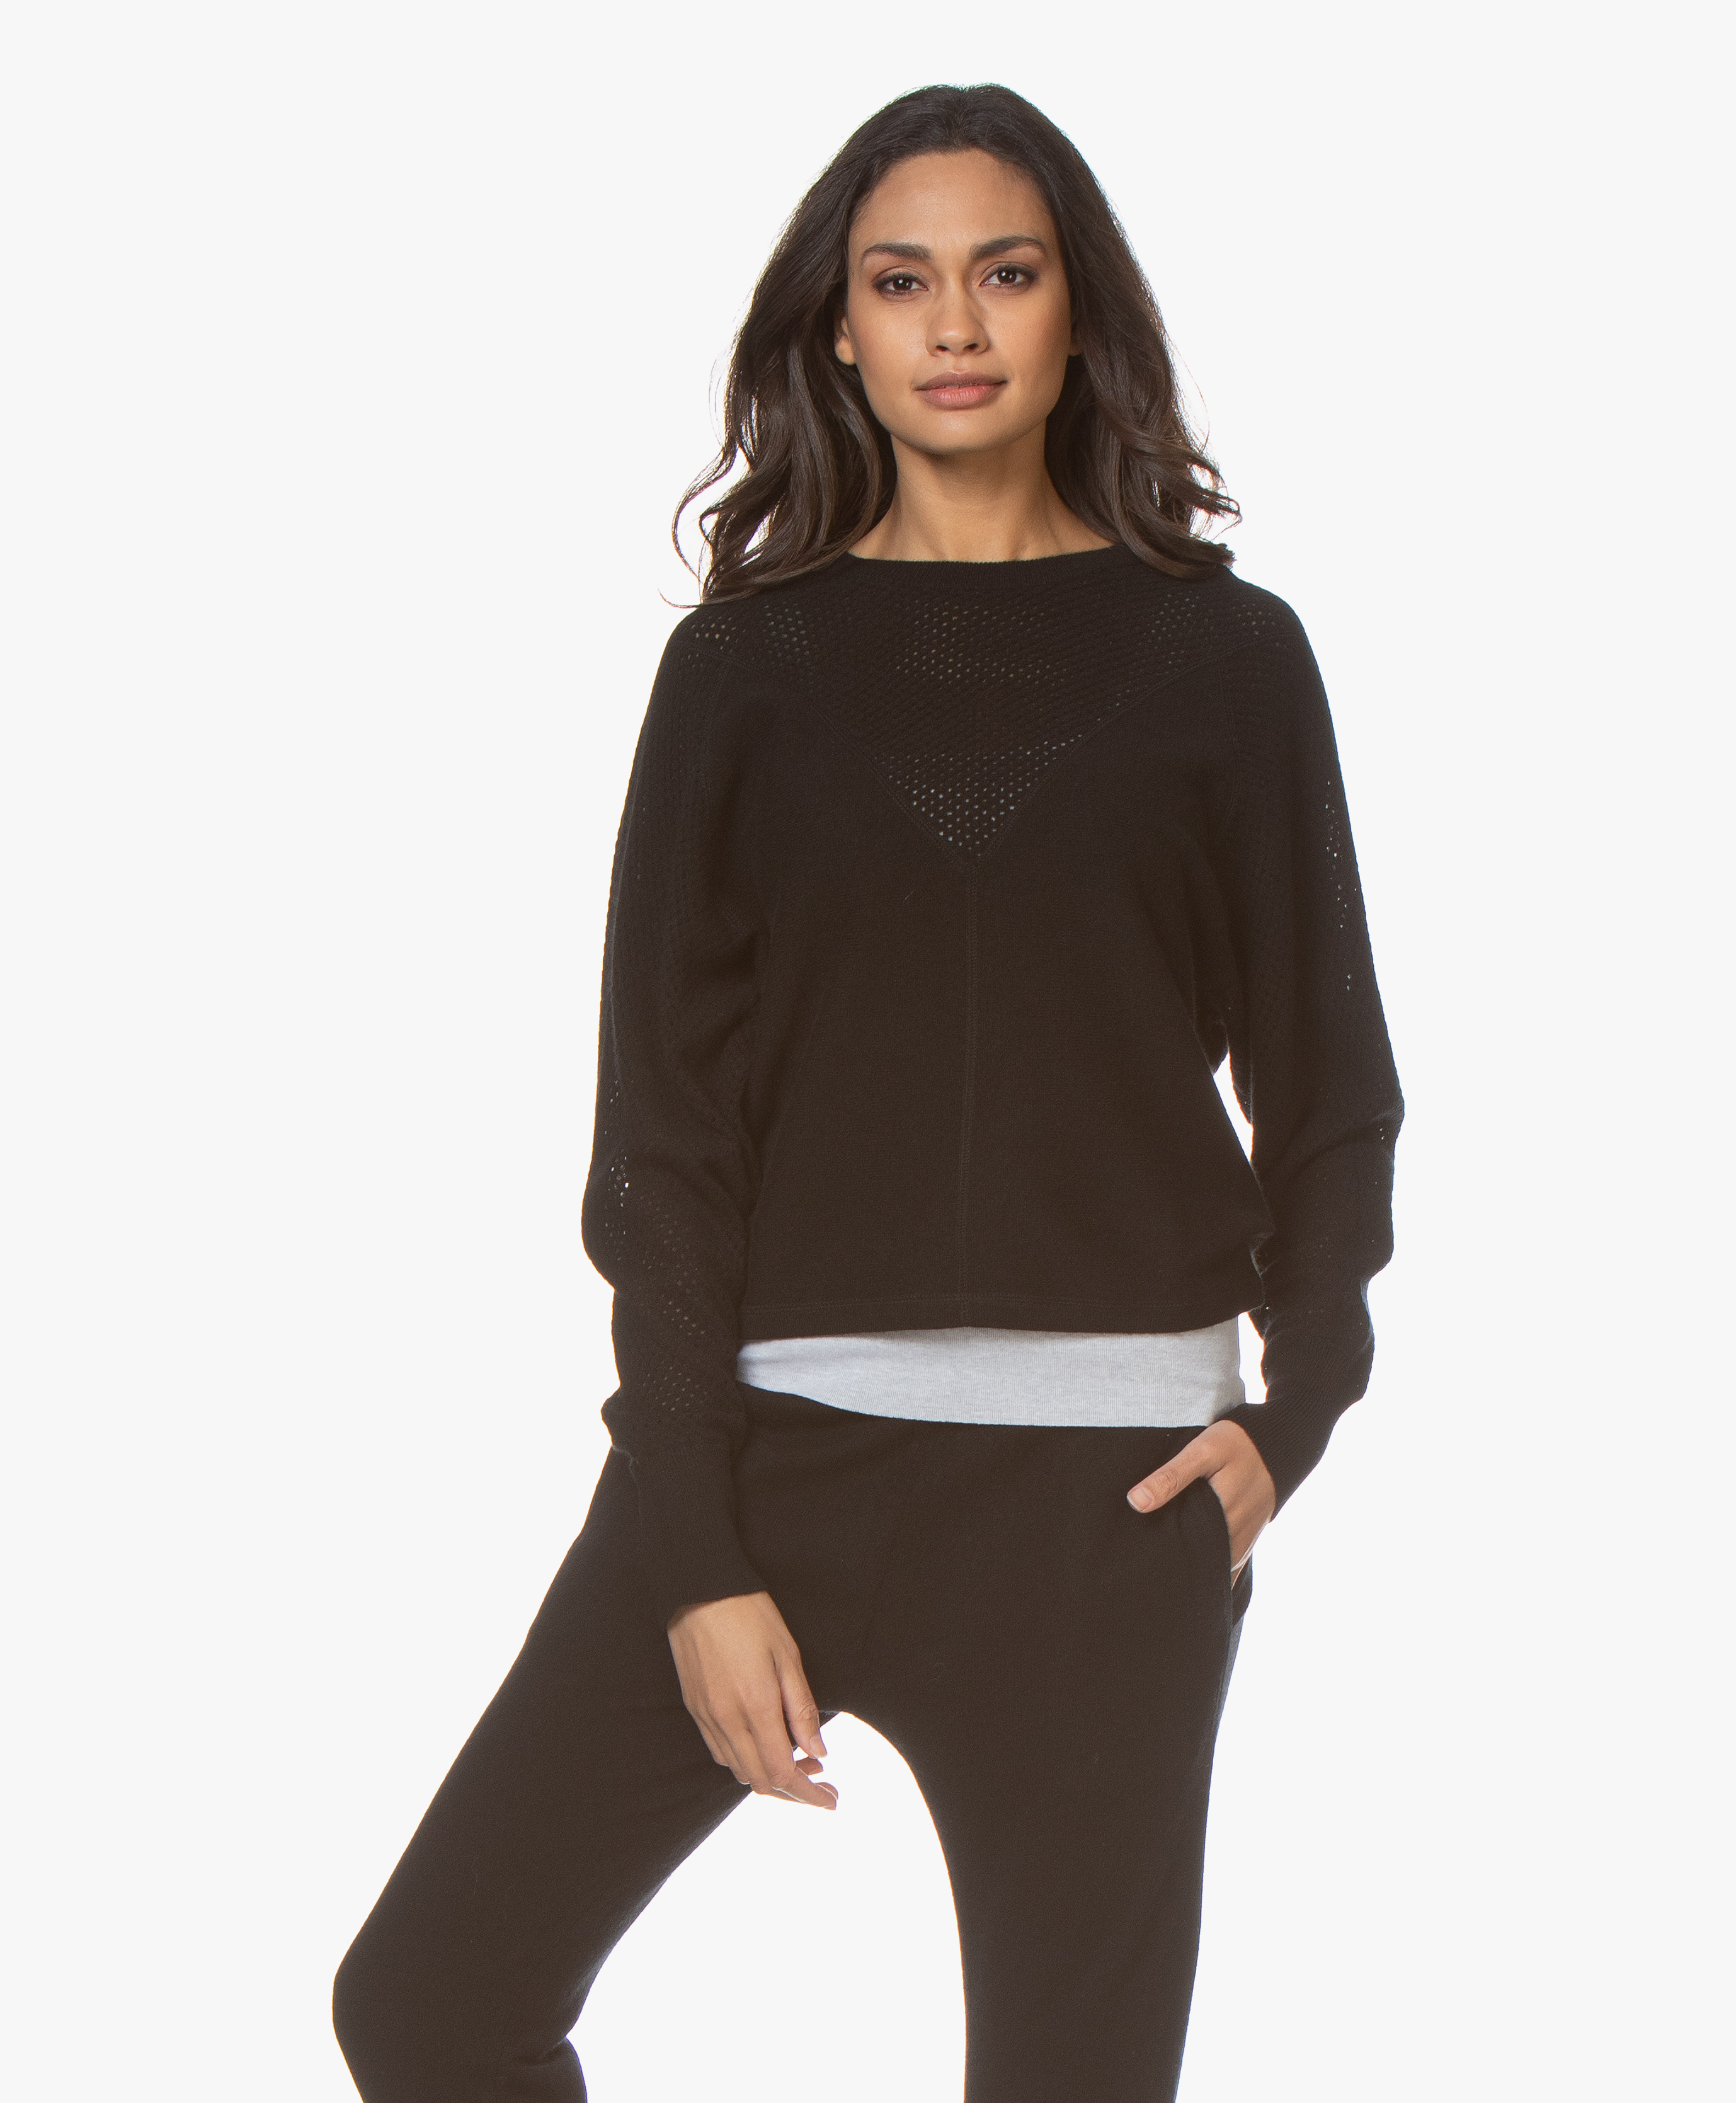 Filippa K Soft Sport Mesh Cashmere Sweater Black 26683 1433